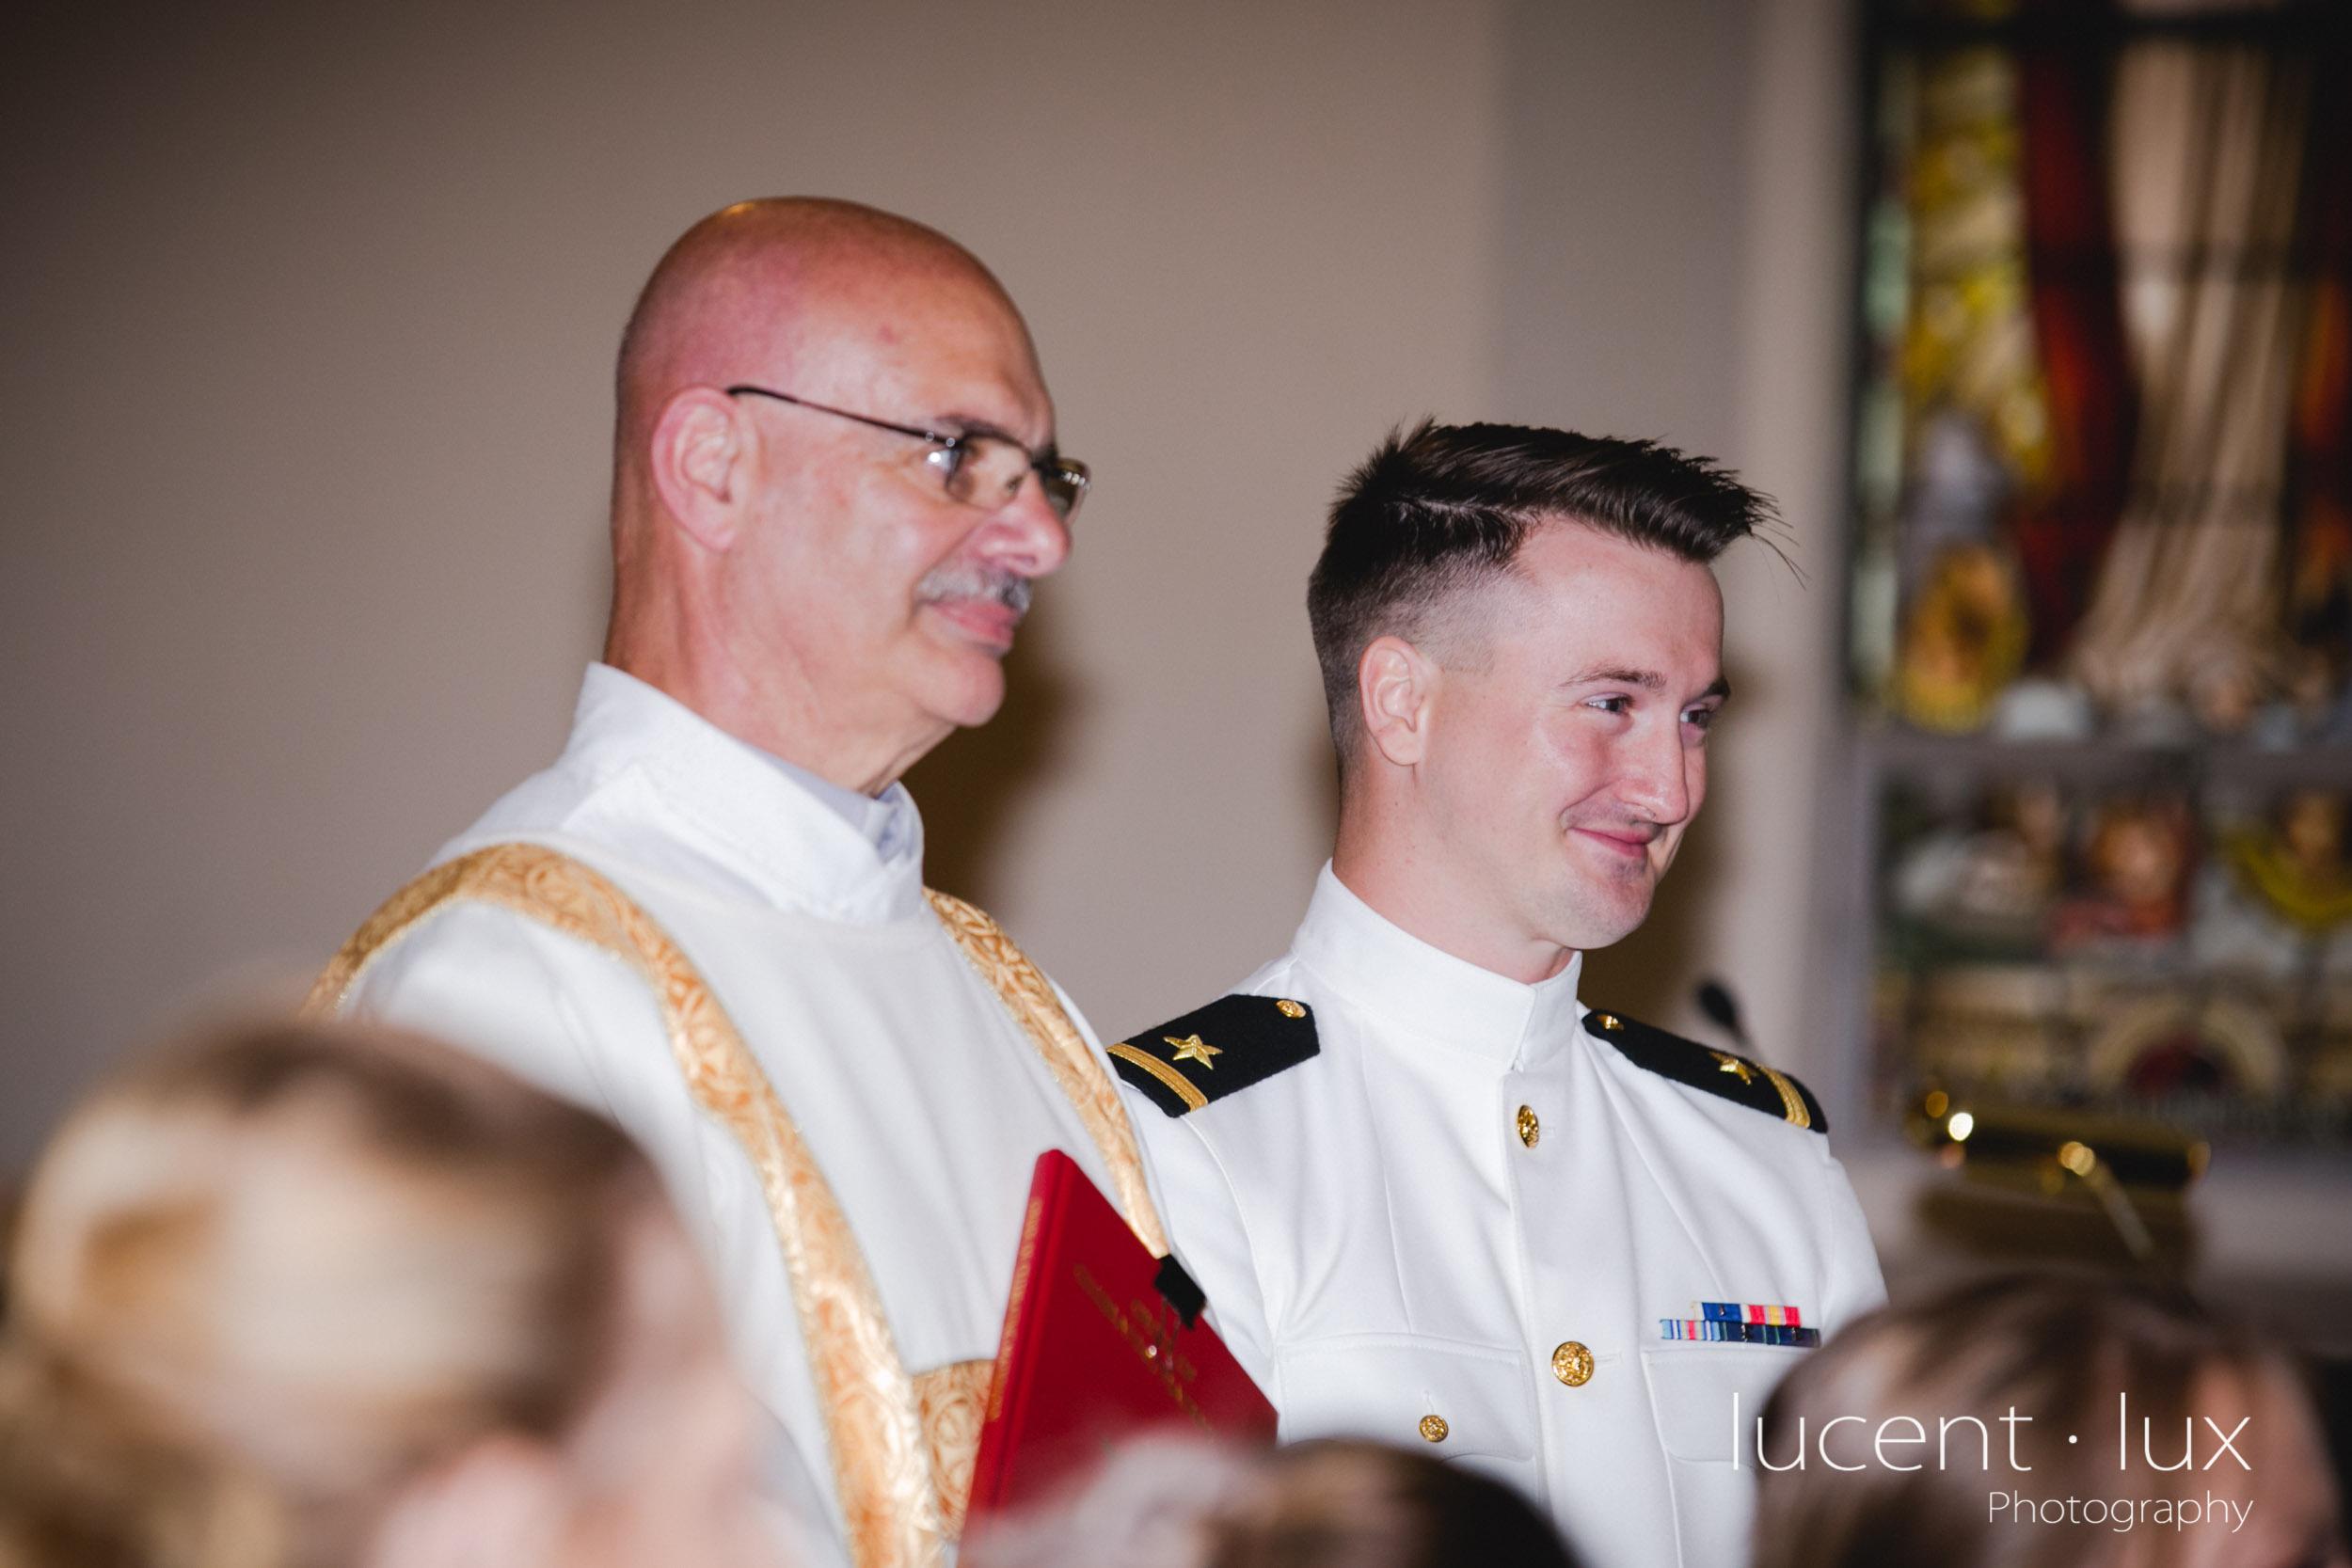 Wedding-Photography-Maryland-Pennsylvania-Photographer-Mendenhall-Inn-Media-Portrait-Event-116.jpg